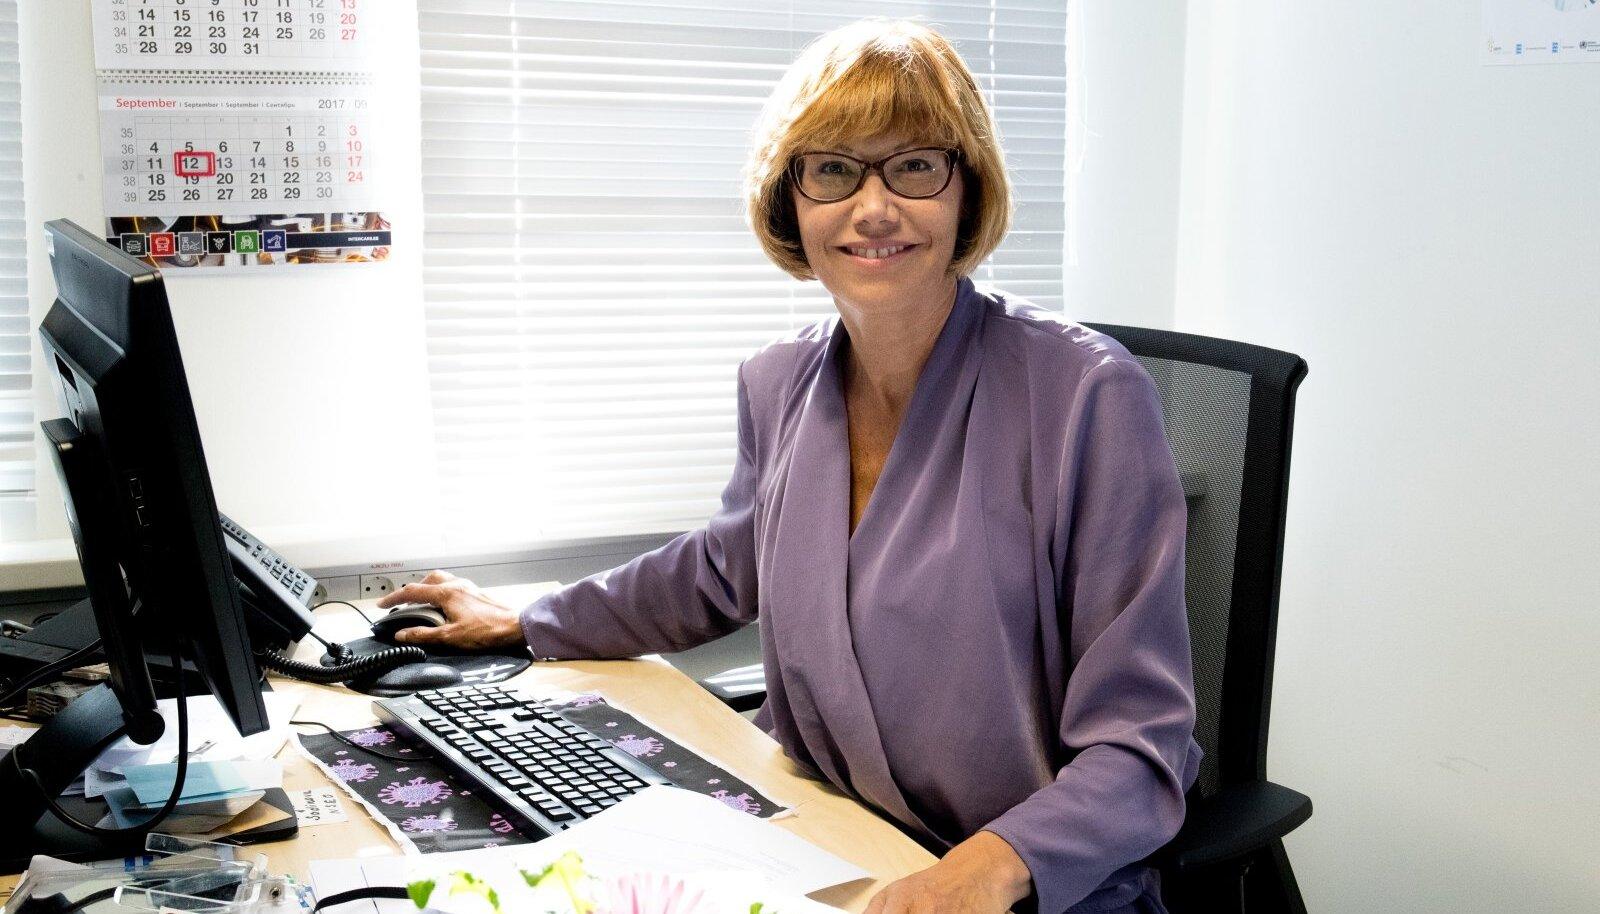 Olga Sadikova